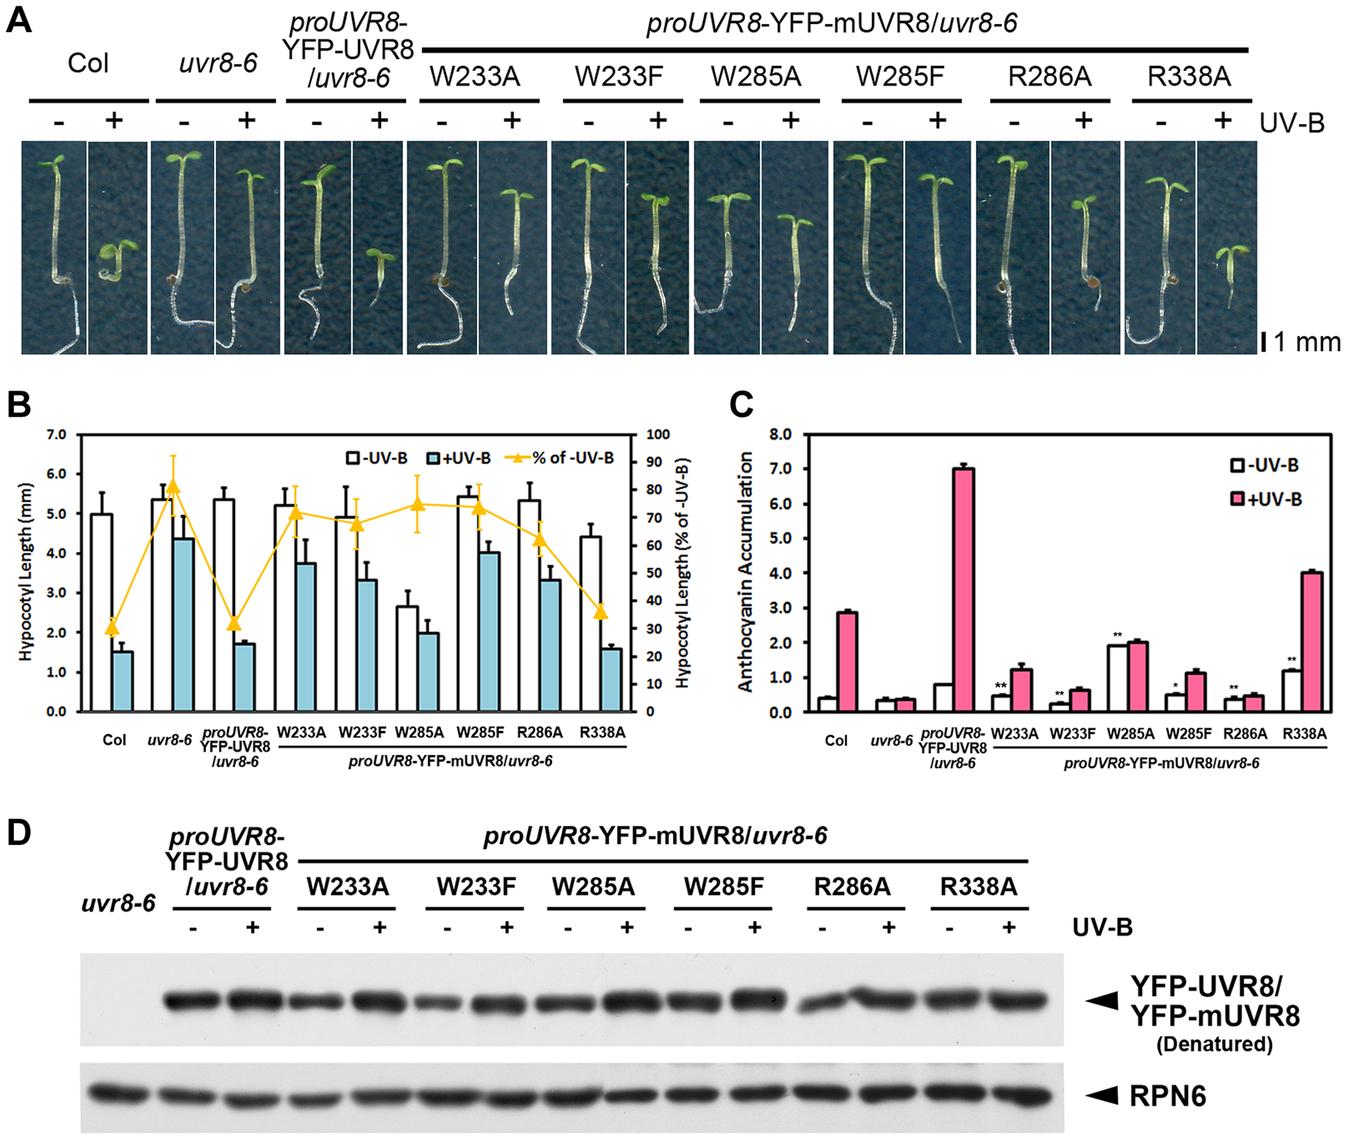 UVR8 variants result in impaired UV-B-induced photomorphogenesis.